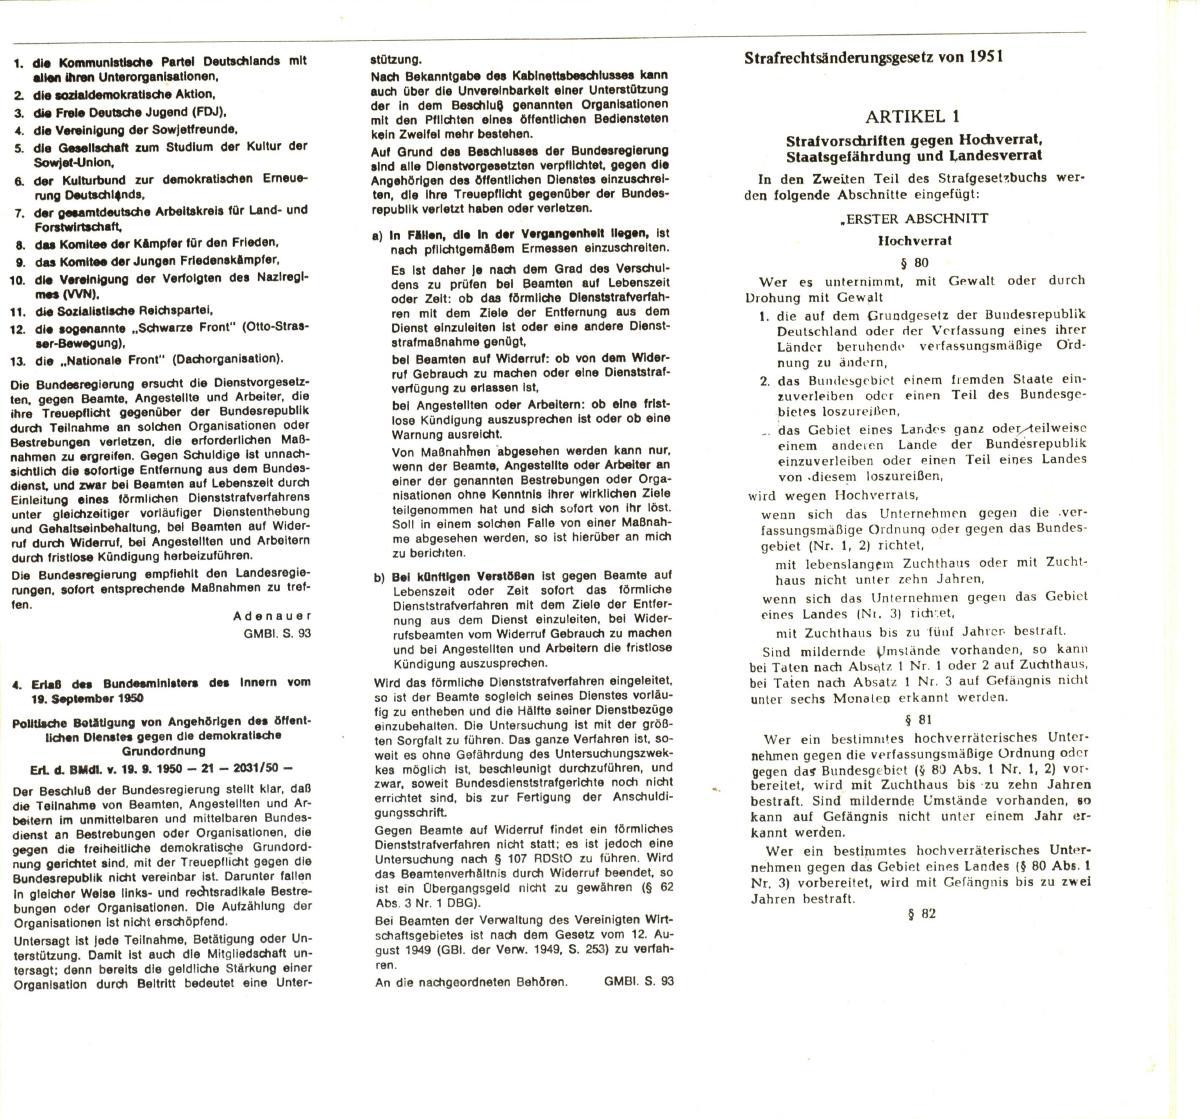 REP_VLB_1976_Die_Zensurgesetze_42